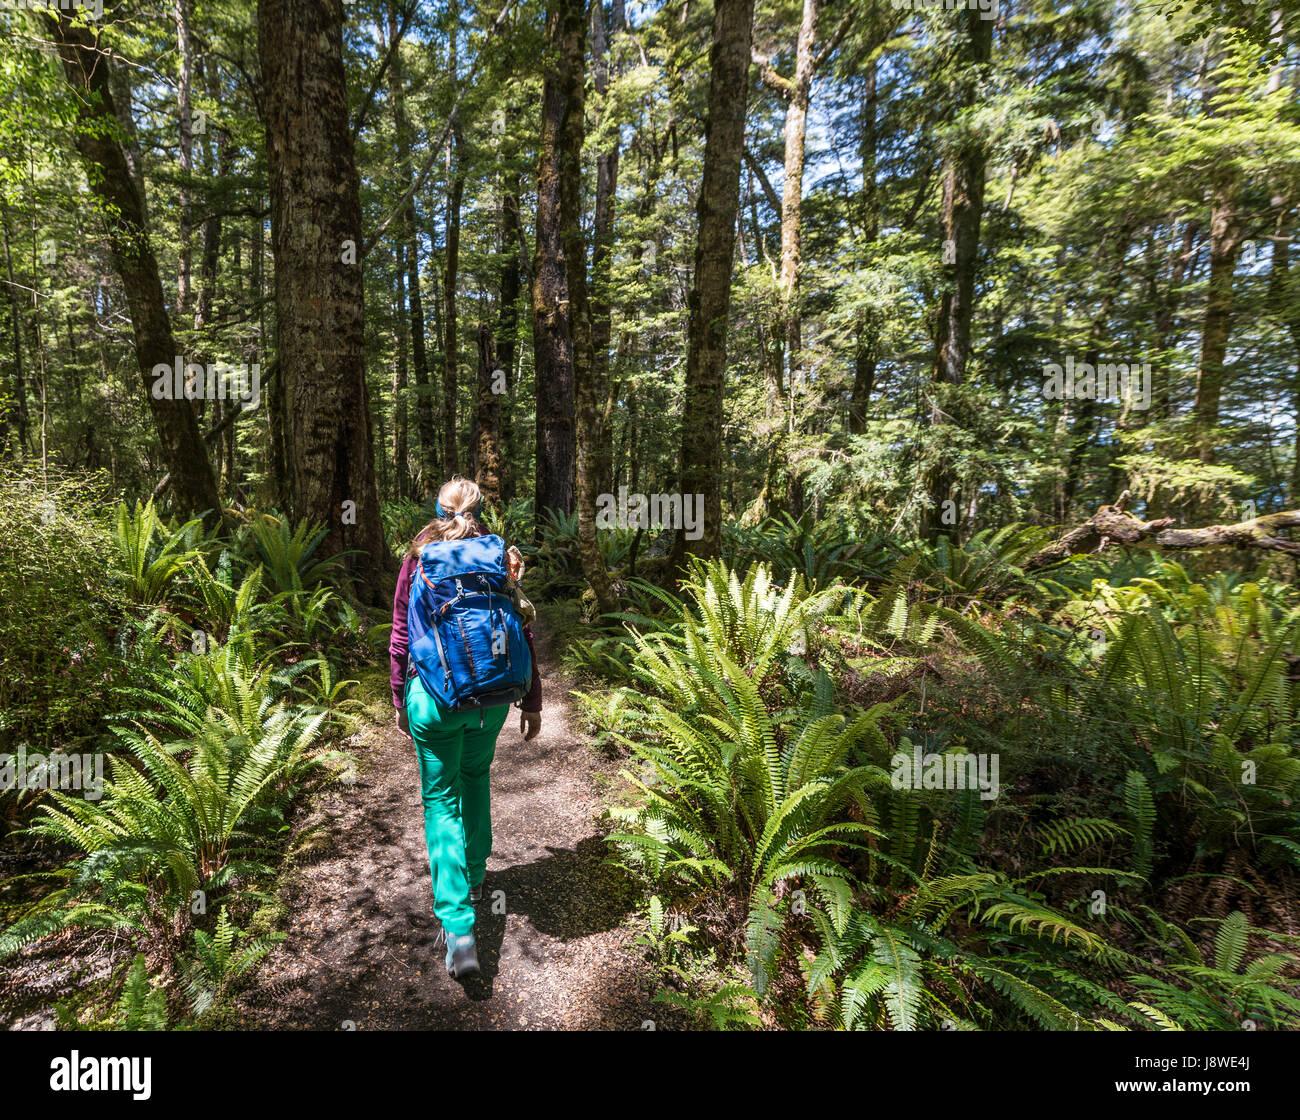 Weibliche Wanderer auf Kepler Track, Wald mit Farnen, Fjordland National Park, Southland, Südinsel, Neuseeland Stockbild